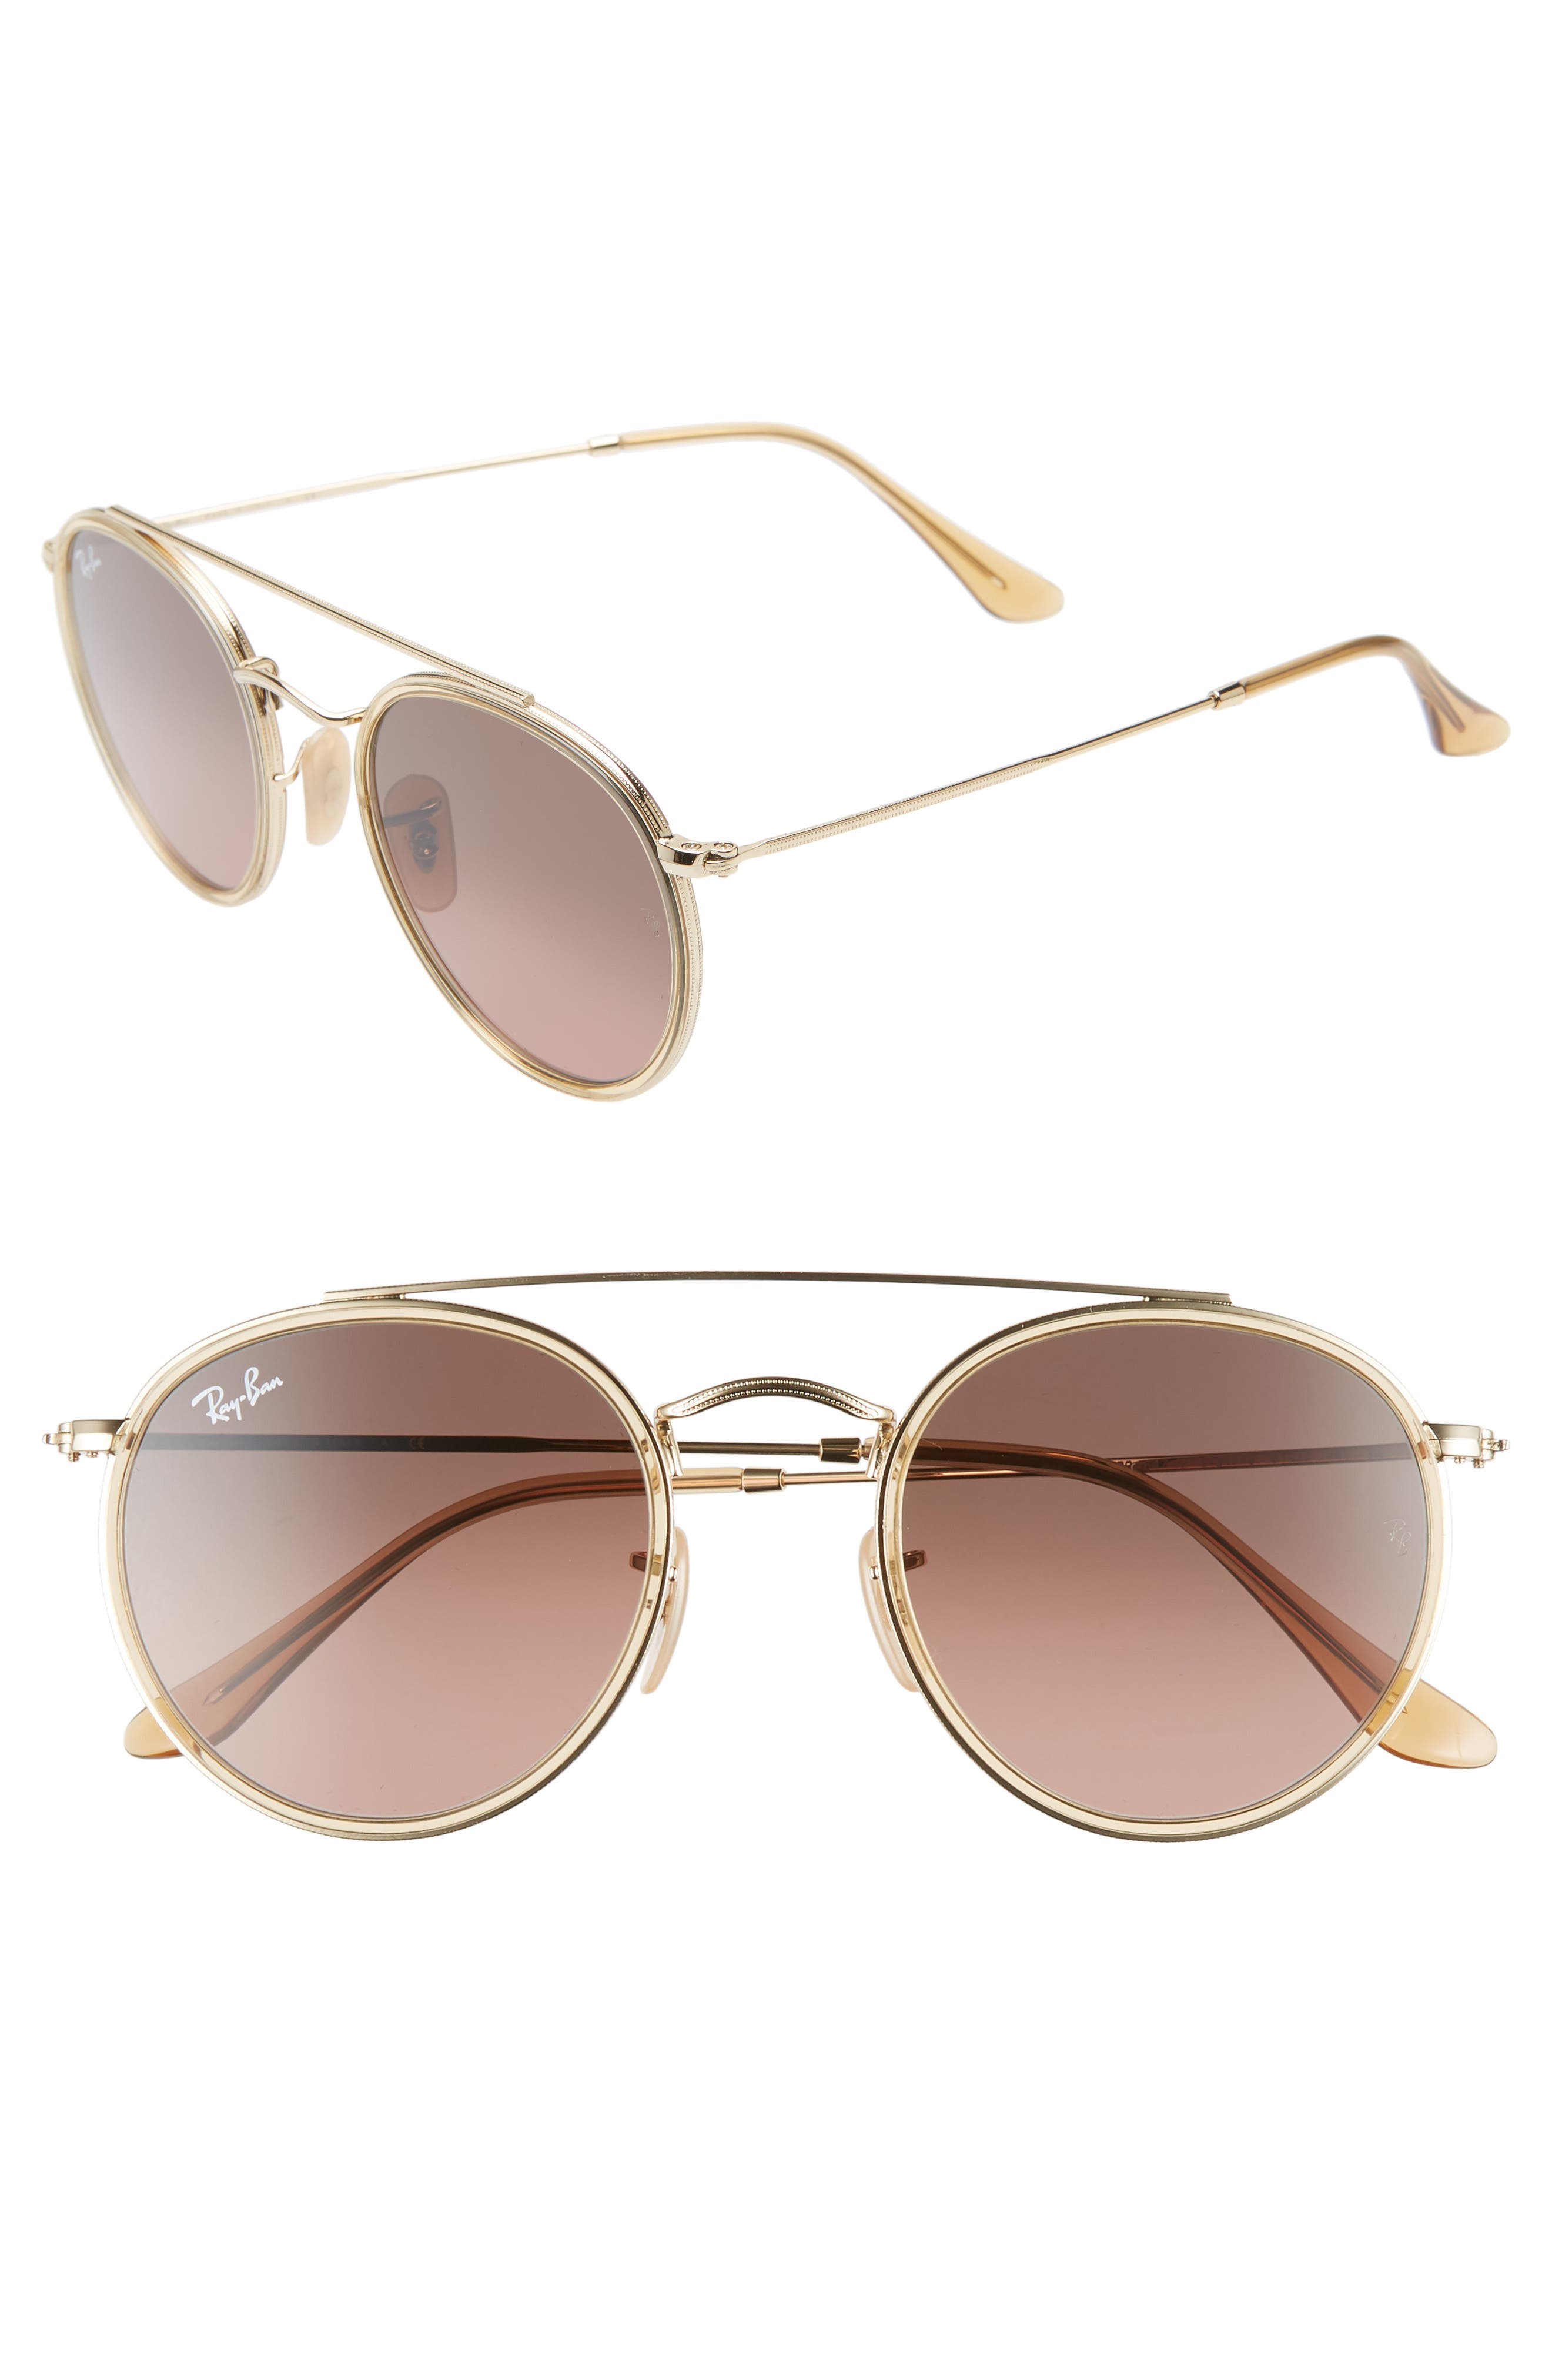 51mm Aviator Gradient Lens Sunglasses,                         Main,                         color, GOLD/ BROWN GRADIENT